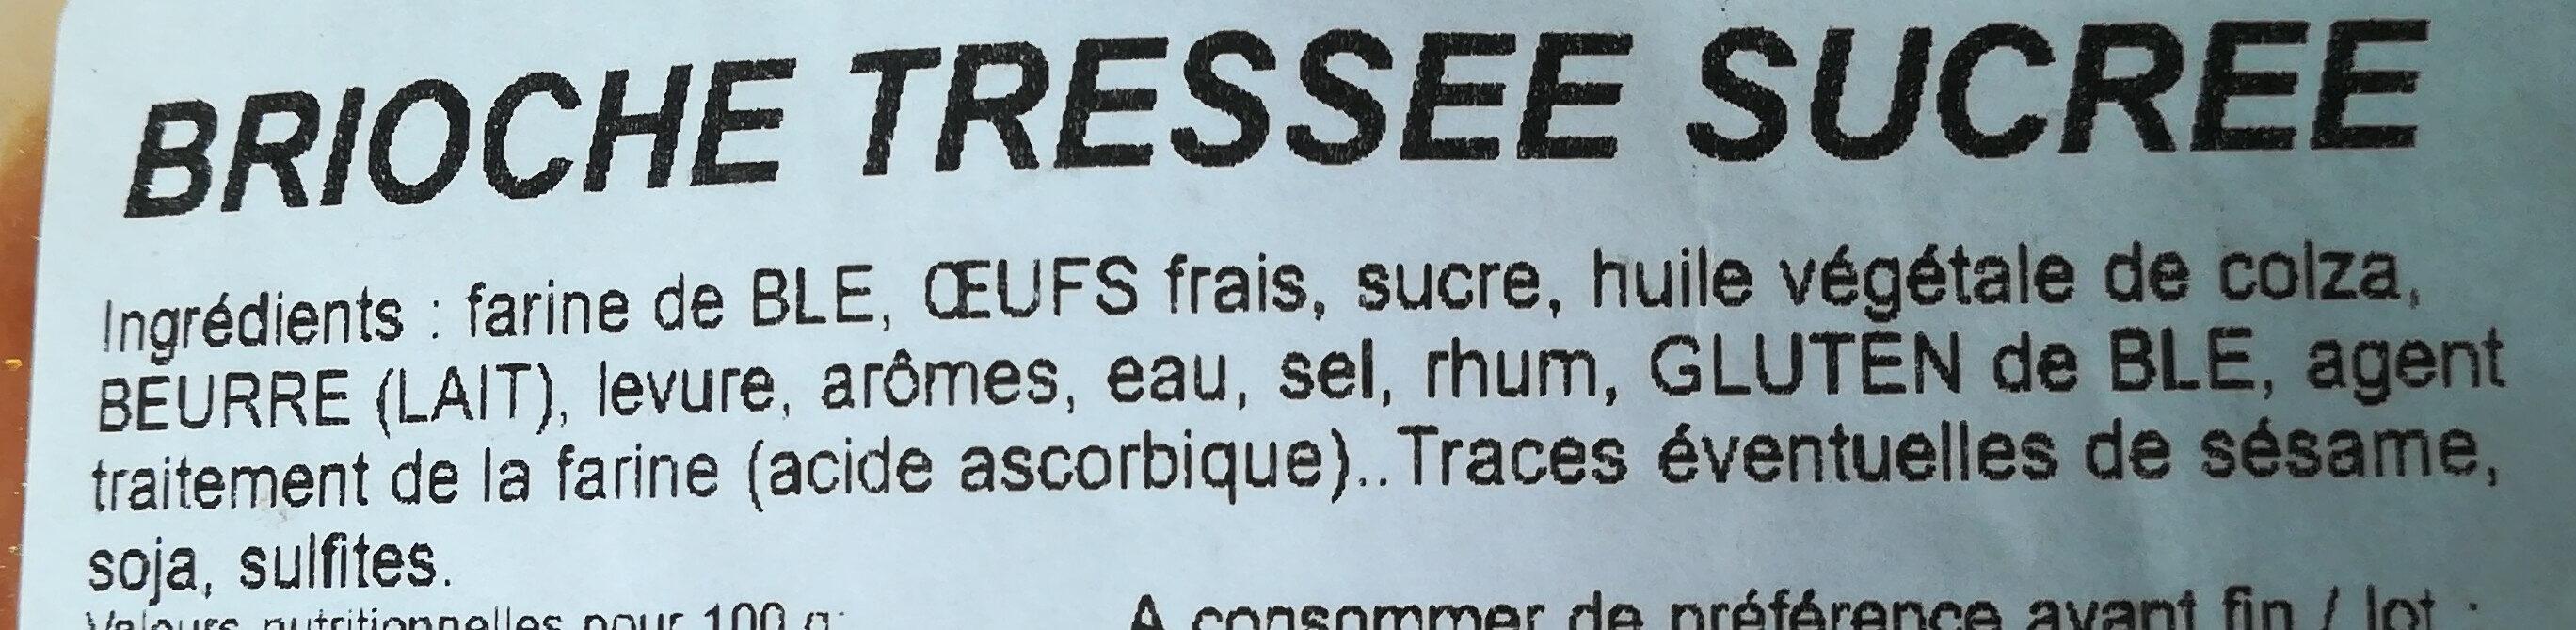 Brioche Tressée Sucrée - Ingredients